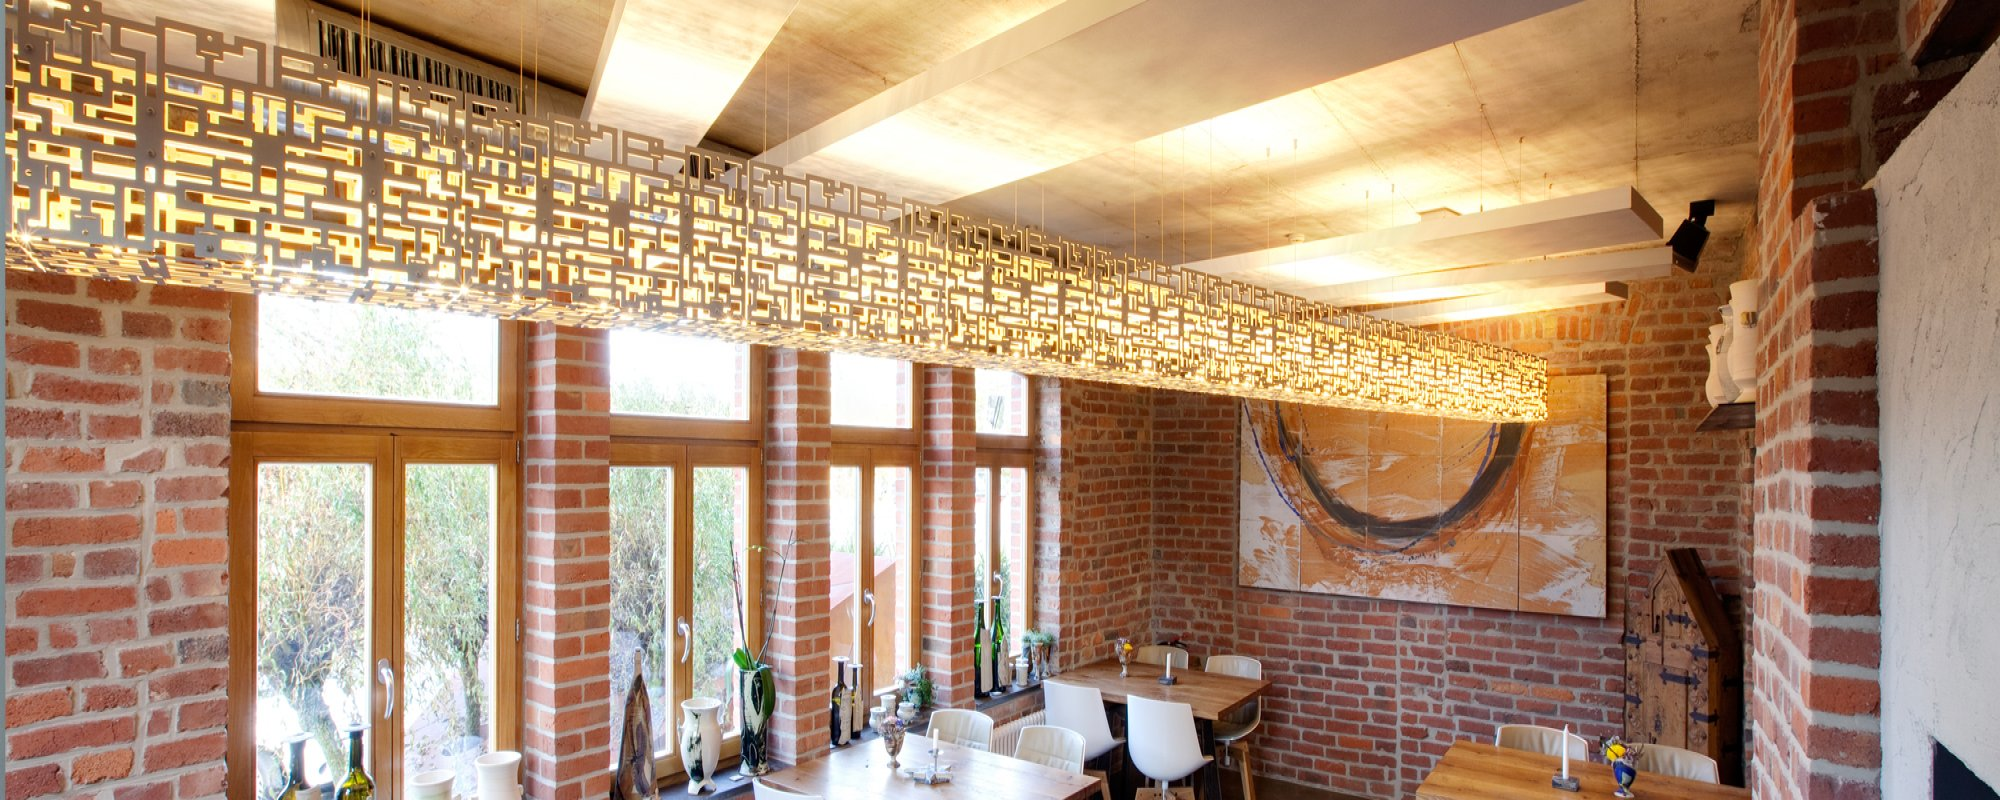 Akustikkunst raumakustik wandabsorber raumteiler for Schiebefenster konfigurator